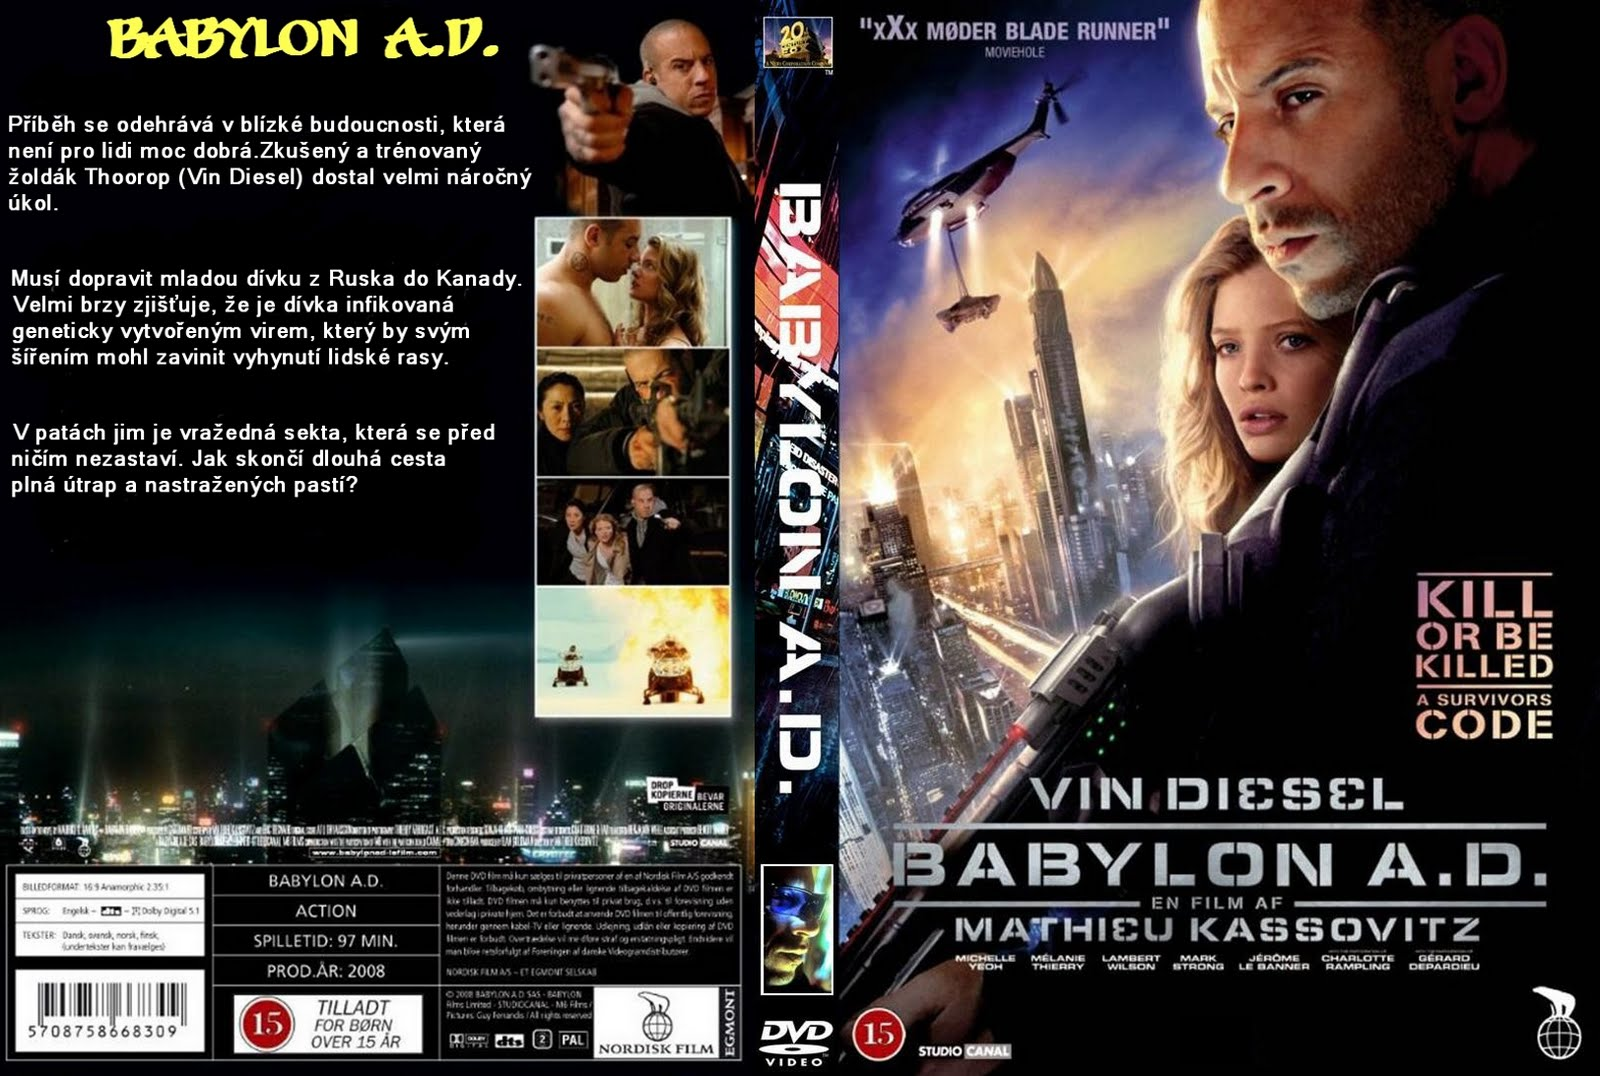 http://2.bp.blogspot.com/-5vImerLzs6w/TfedXN9gcqI/AAAAAAAAdj8/Yhw_xi3TbcA/s1600/Babylon_a_d.jpg